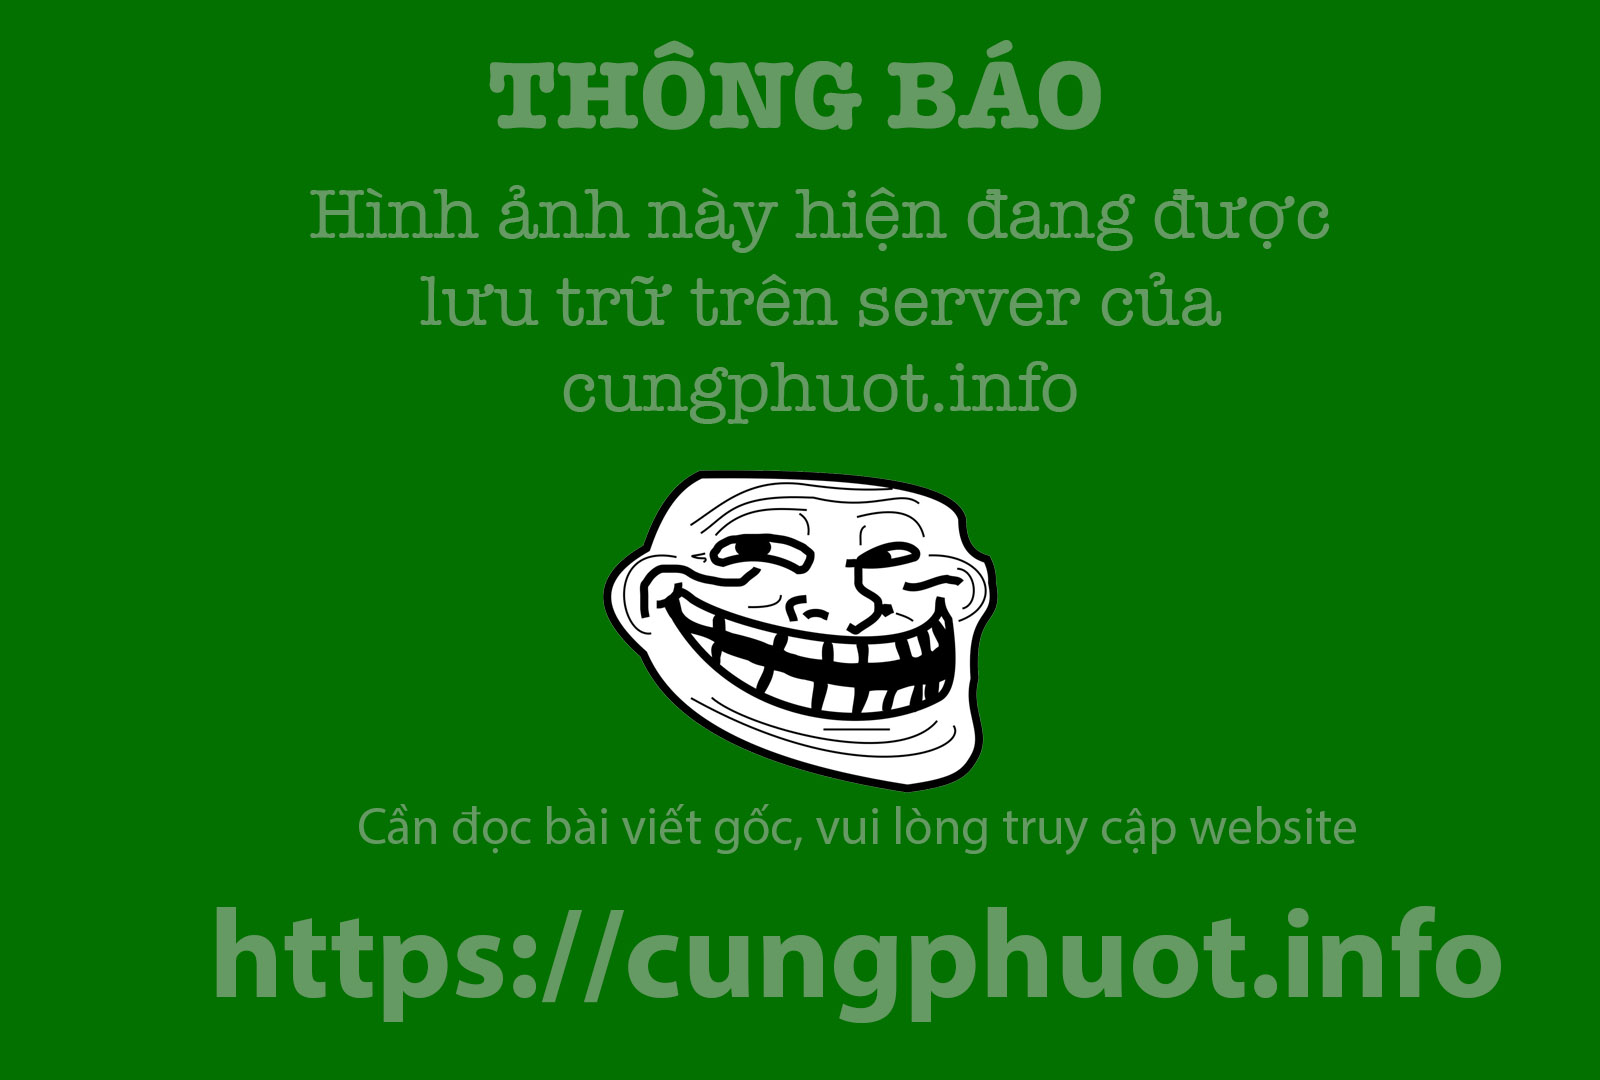 phuot-hue